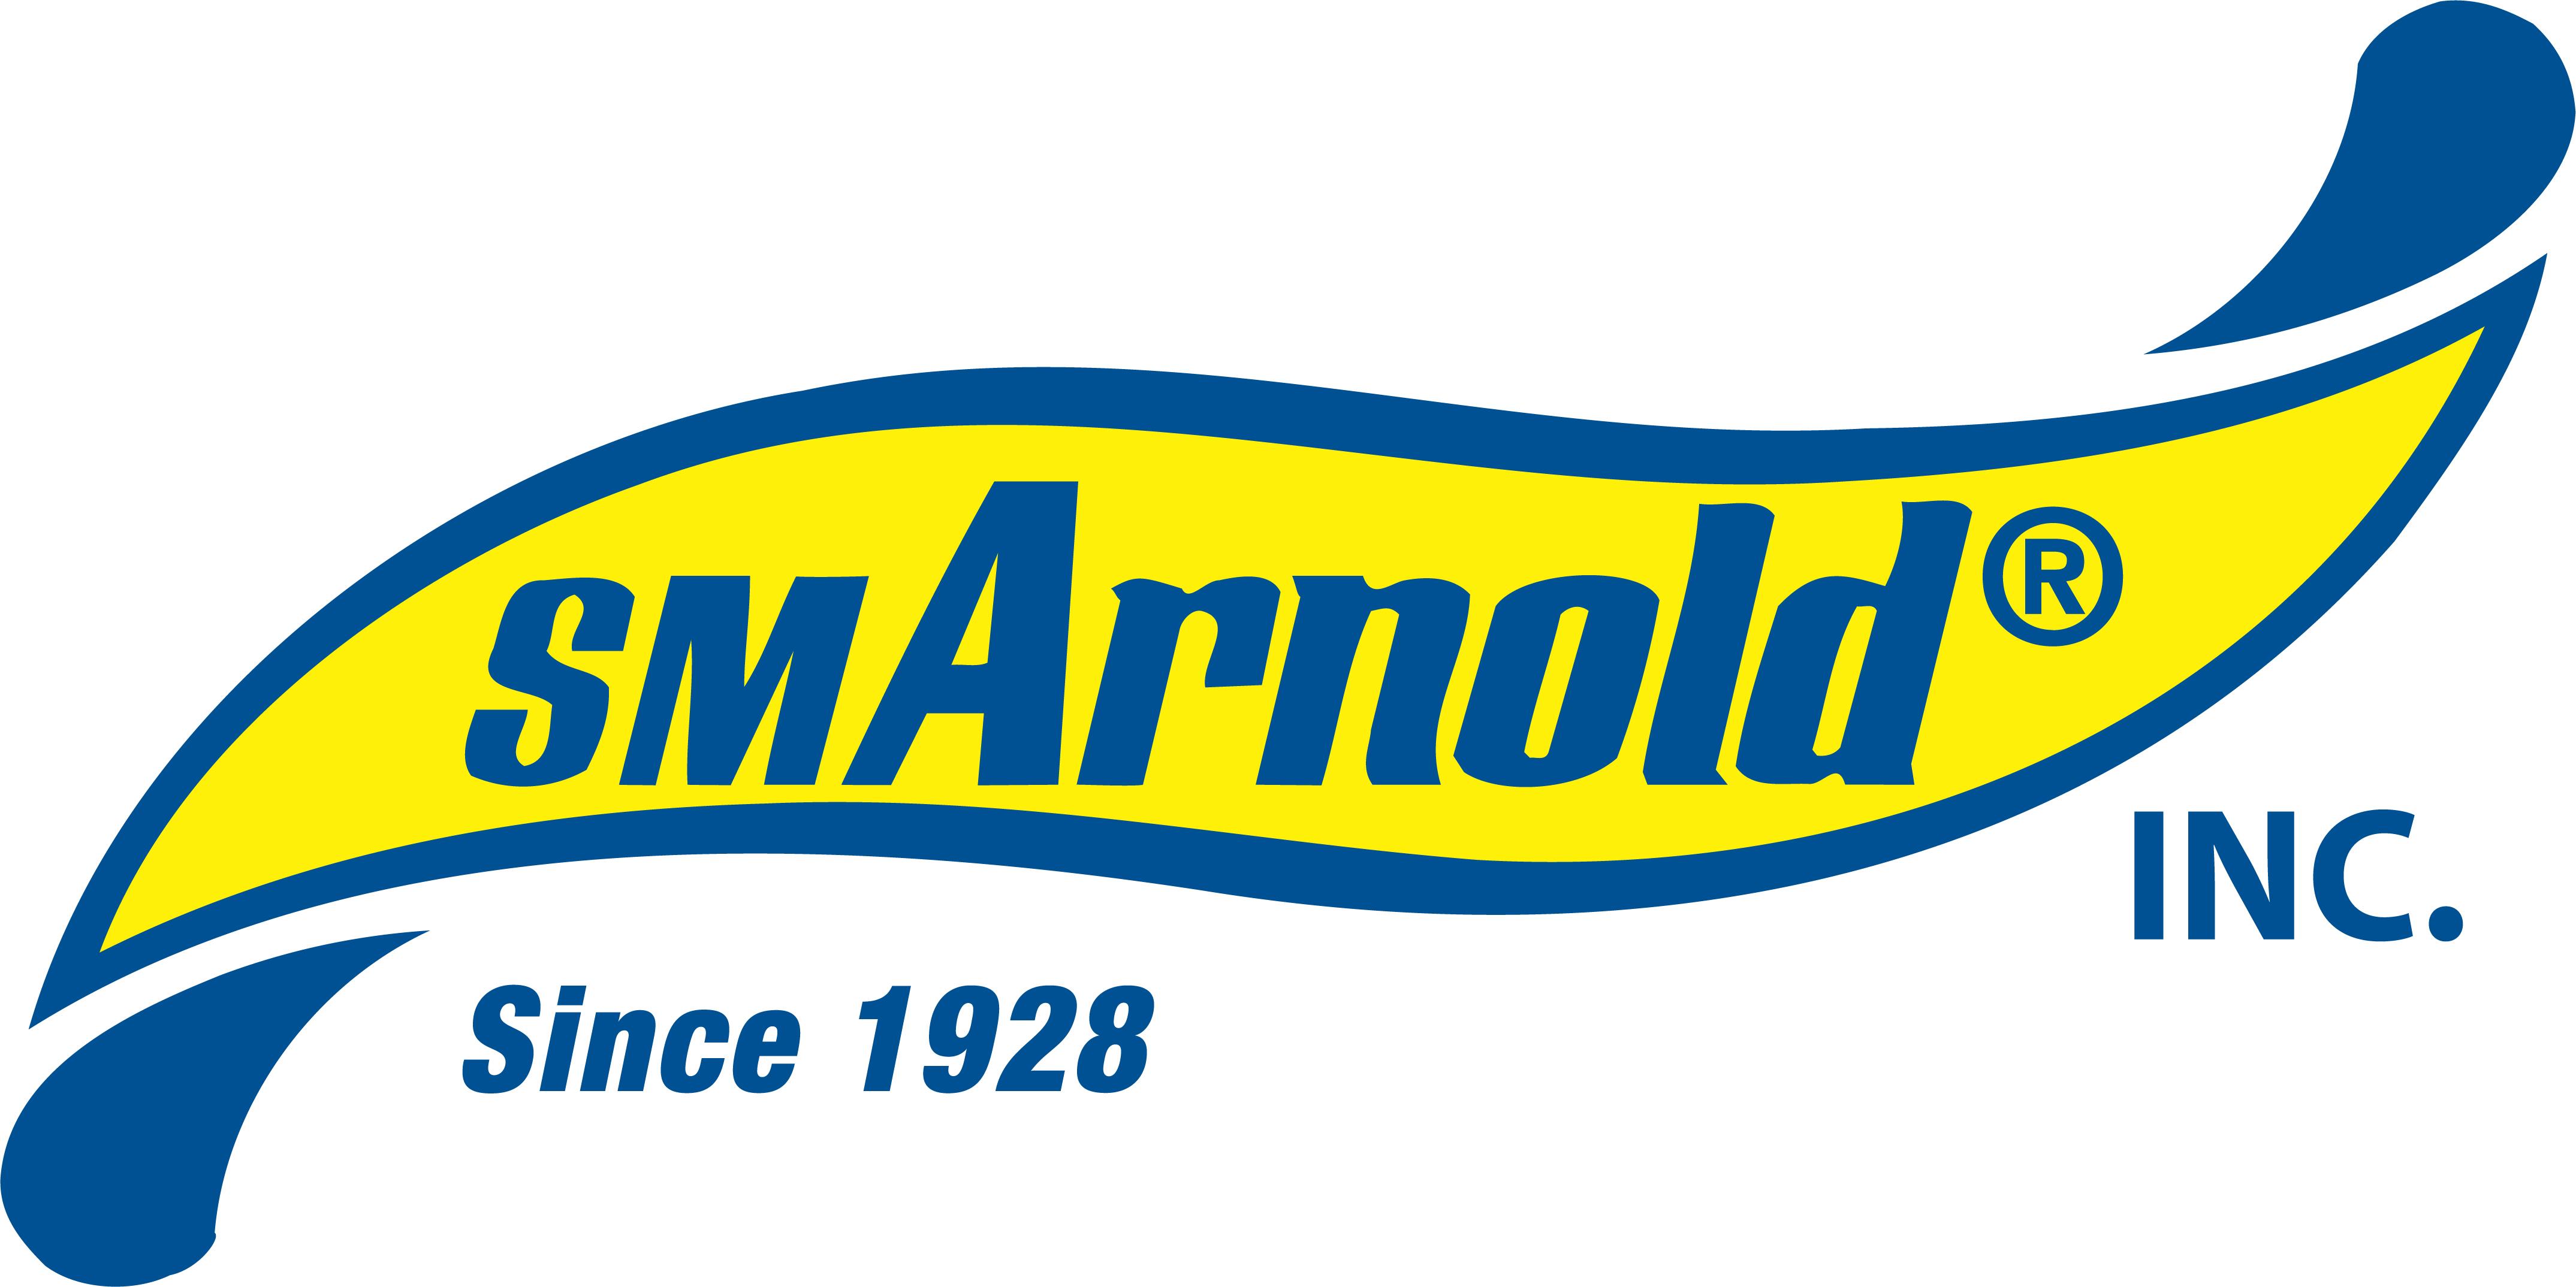 S M Arnold